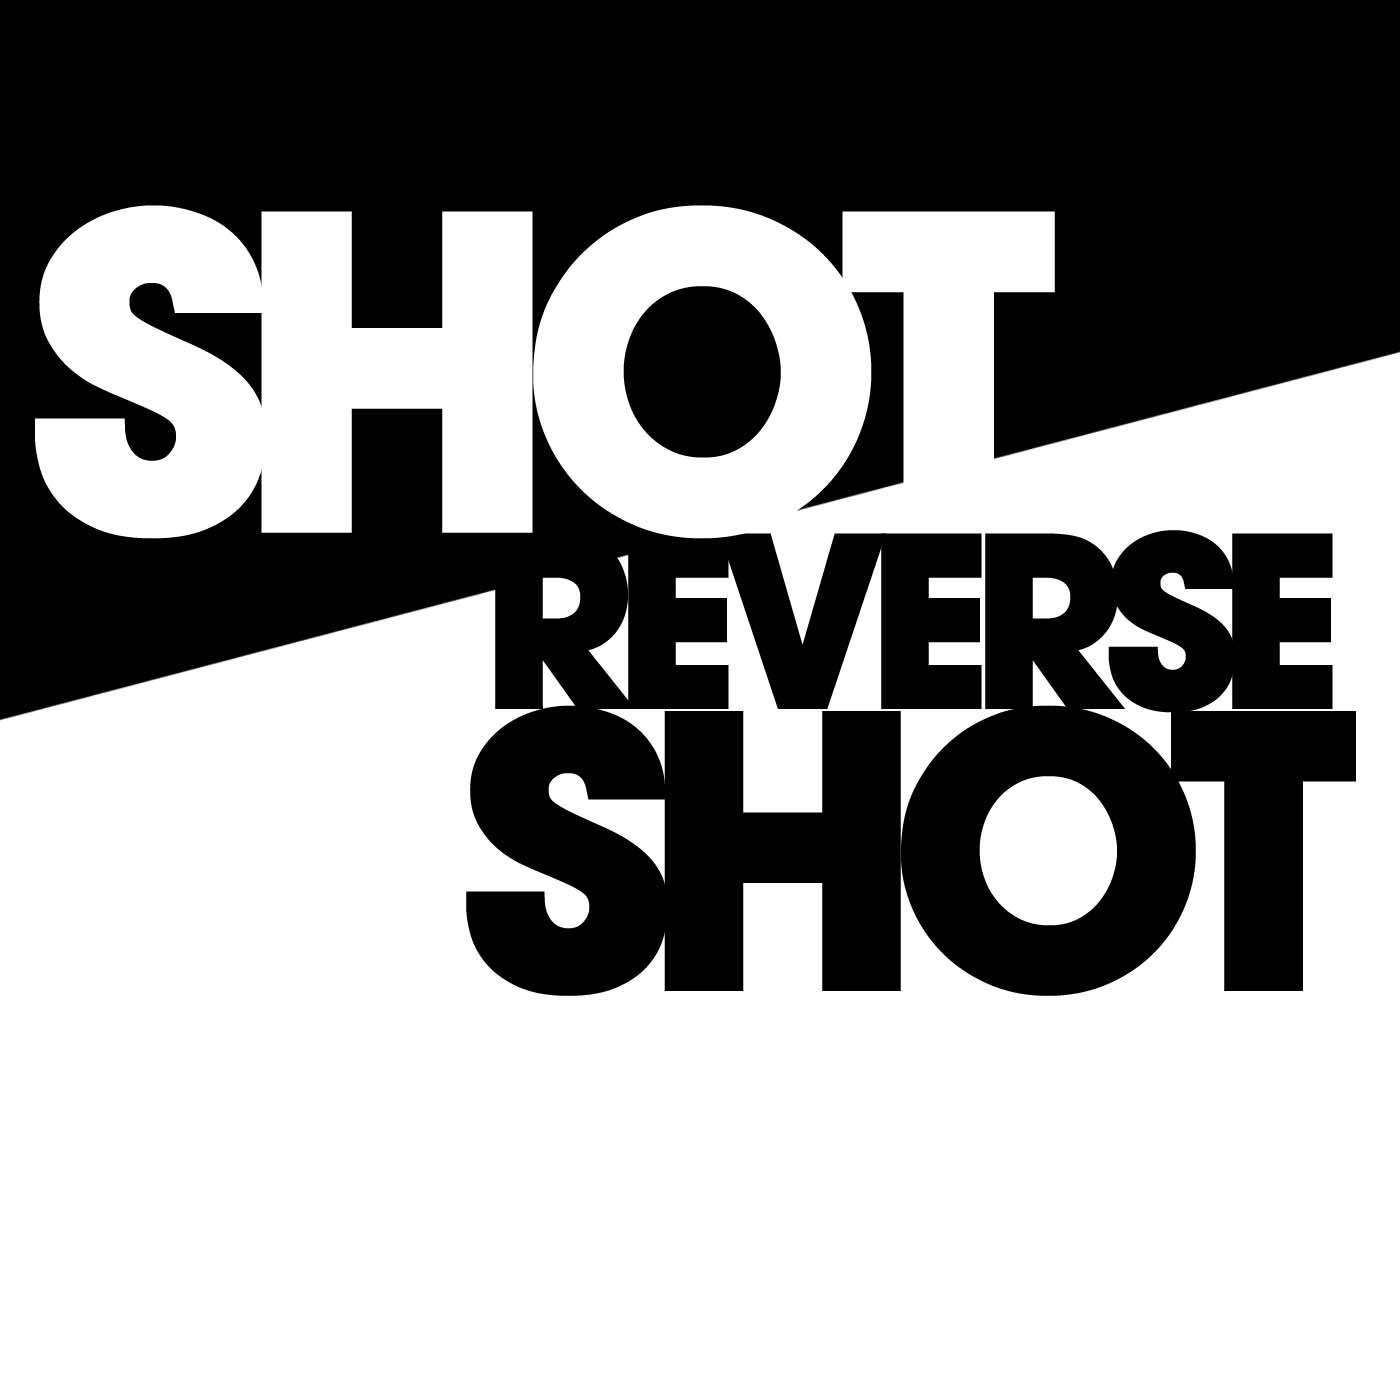 Shot/Reverse Shot